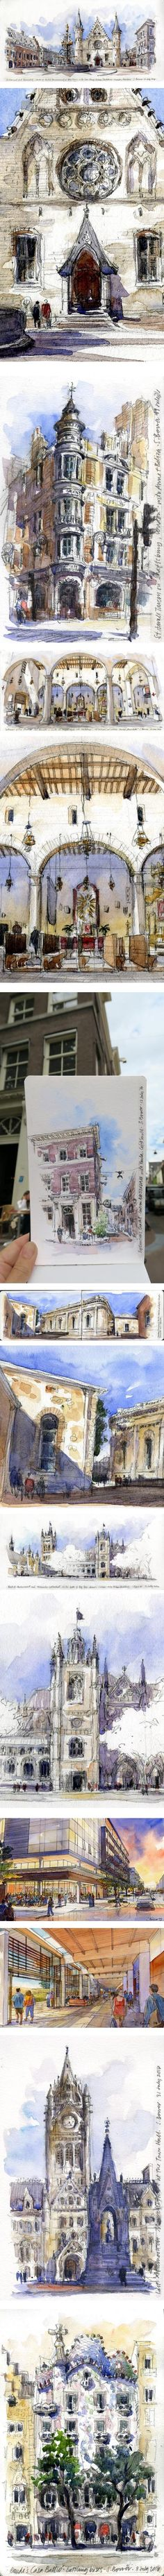 Stephanie Bower, urban sketcher, architectural watercolor illustration